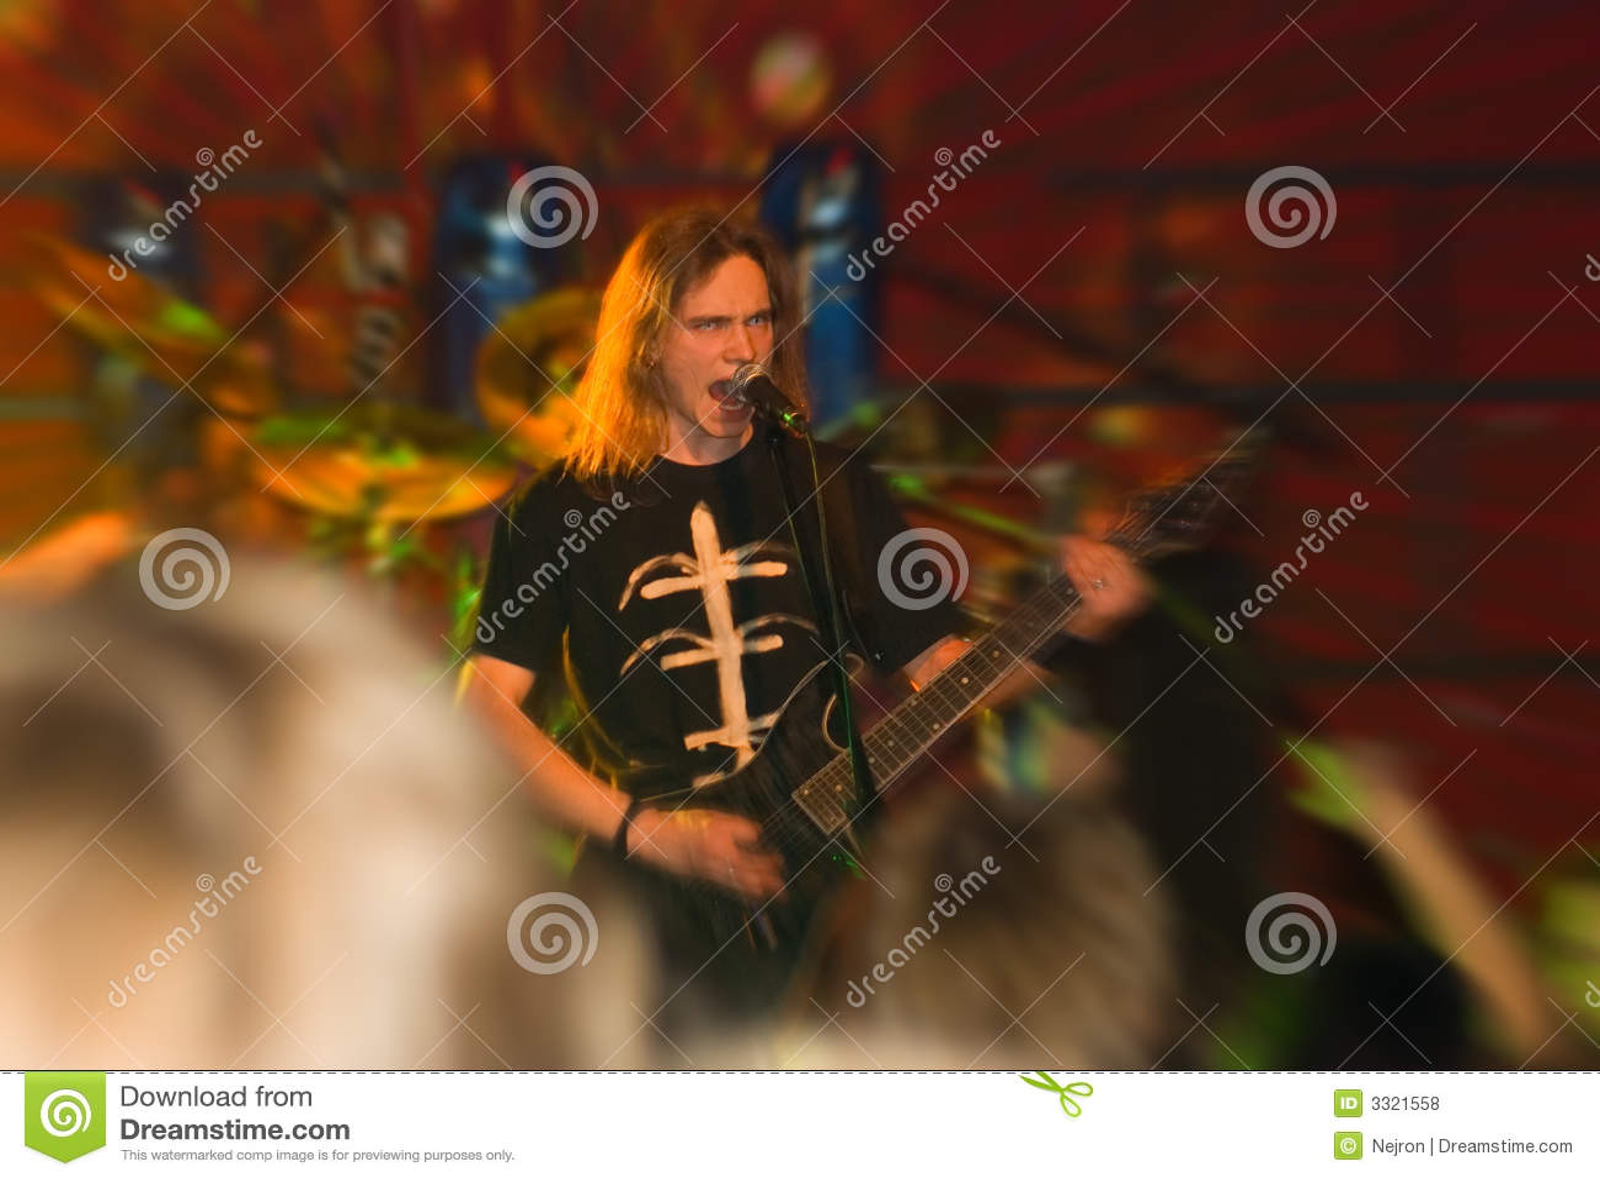 Metal band concert